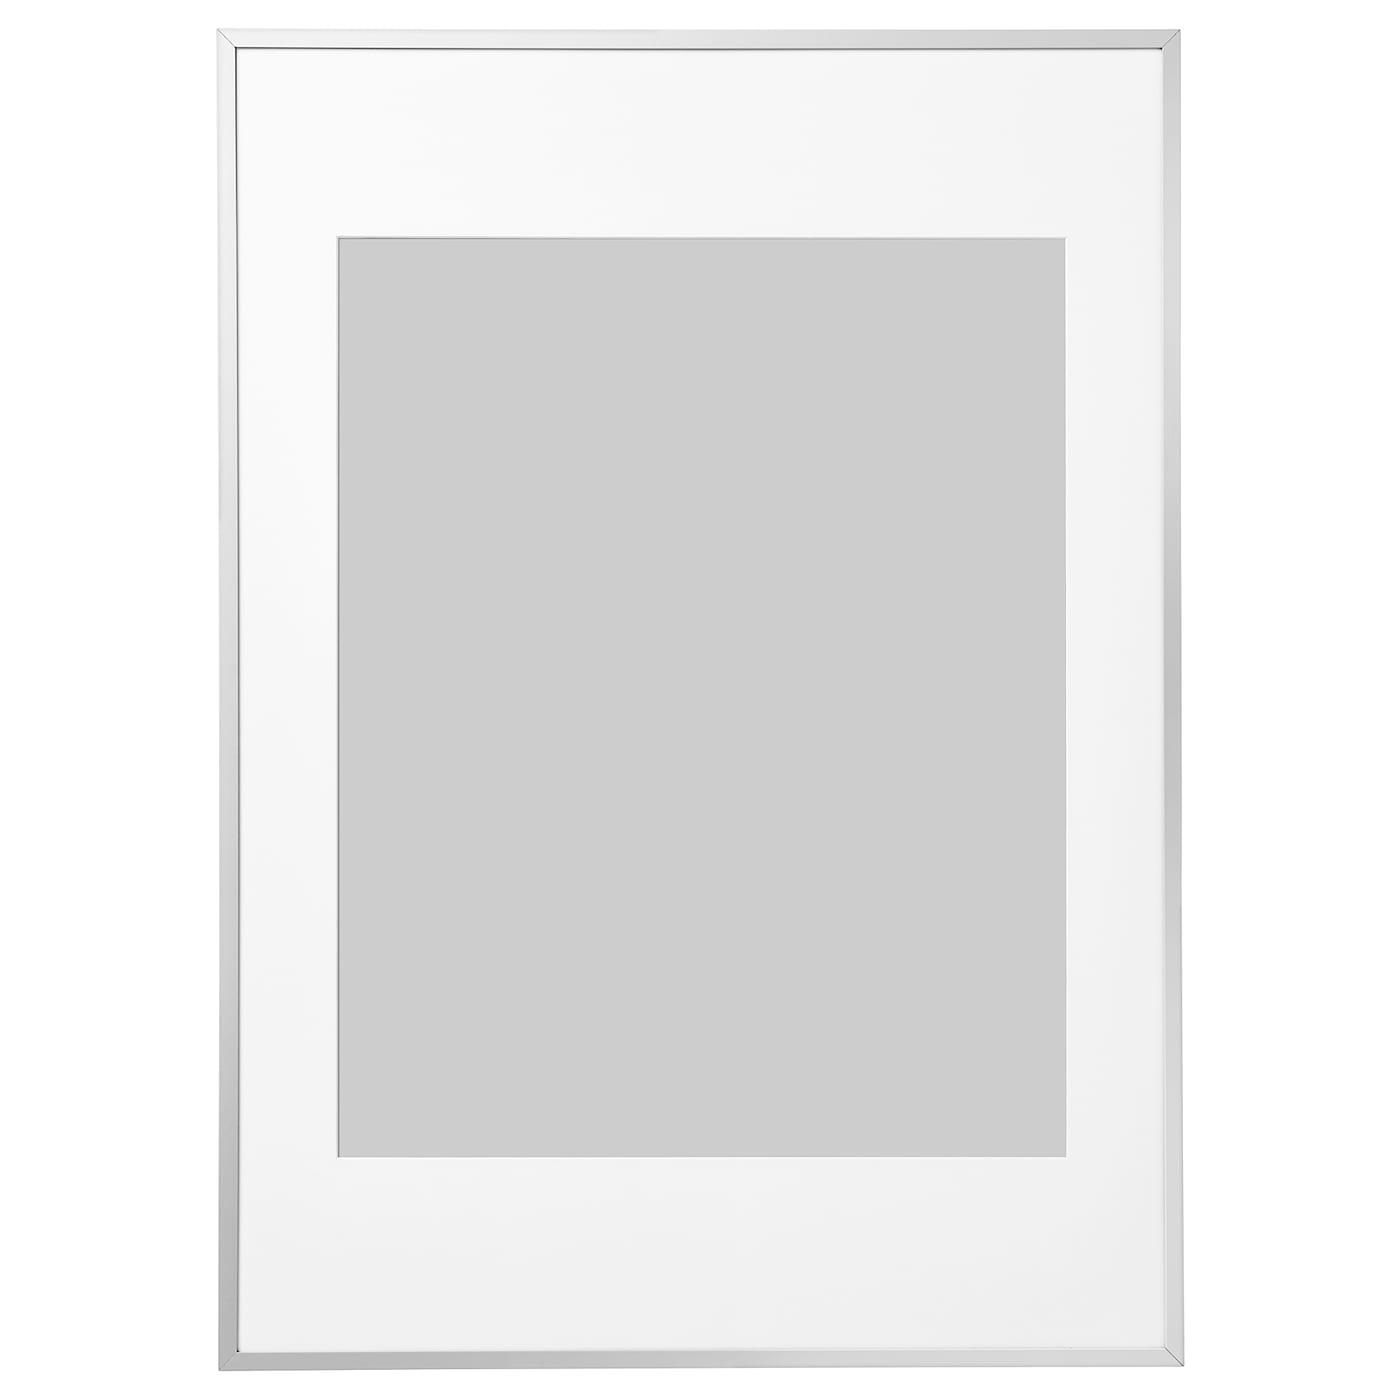 LOMVIKEN Marco aluminio 50x70 cm